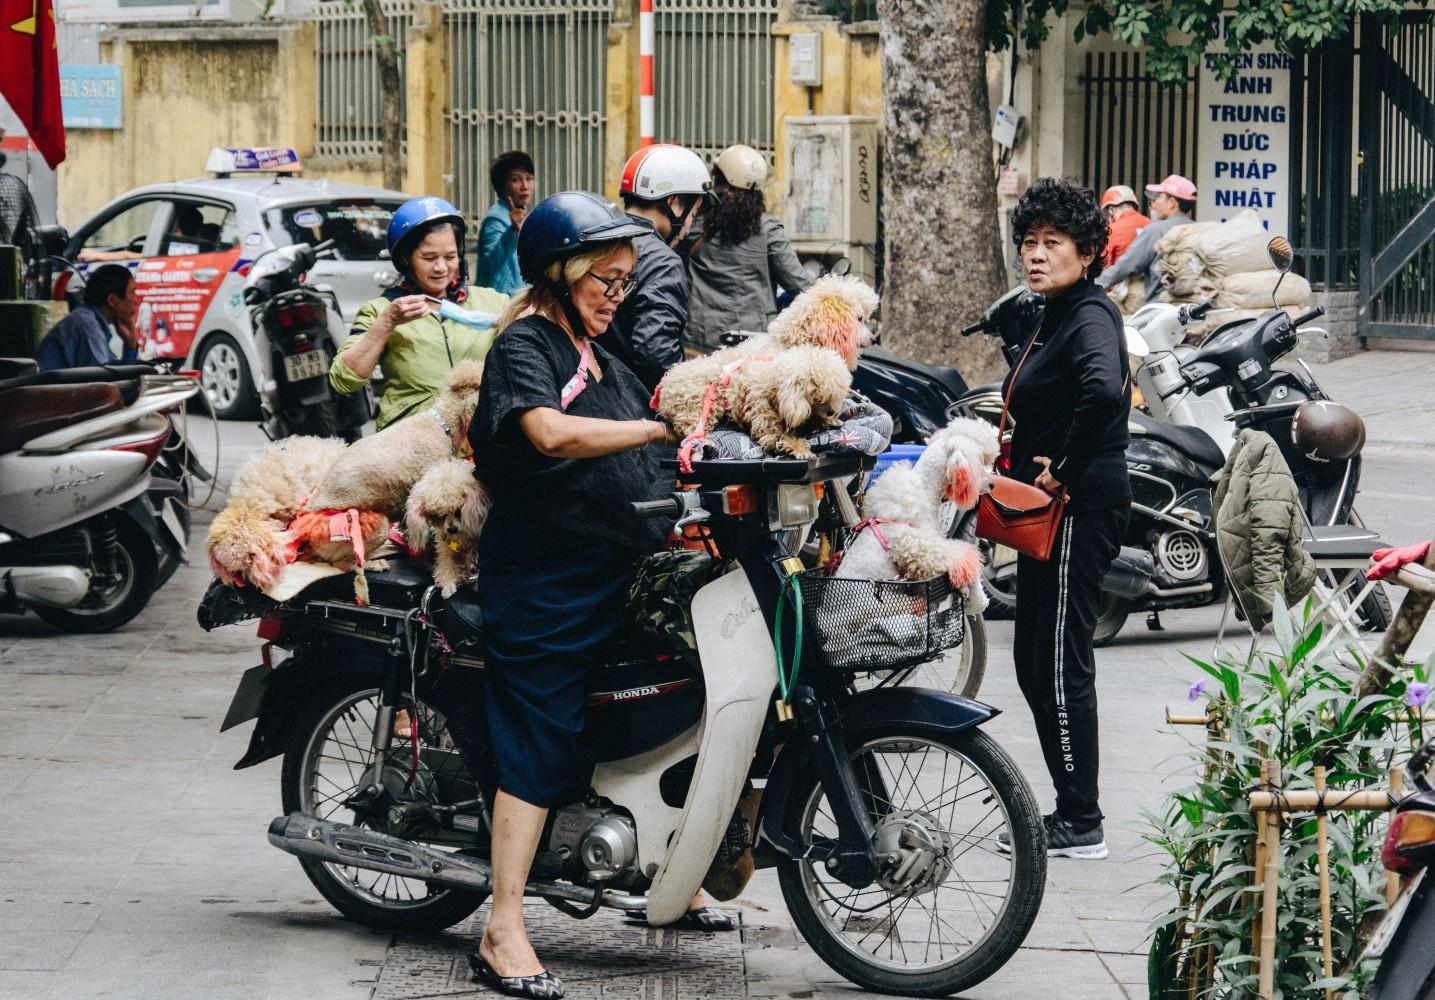 Vietnam, motorcycle, dogs